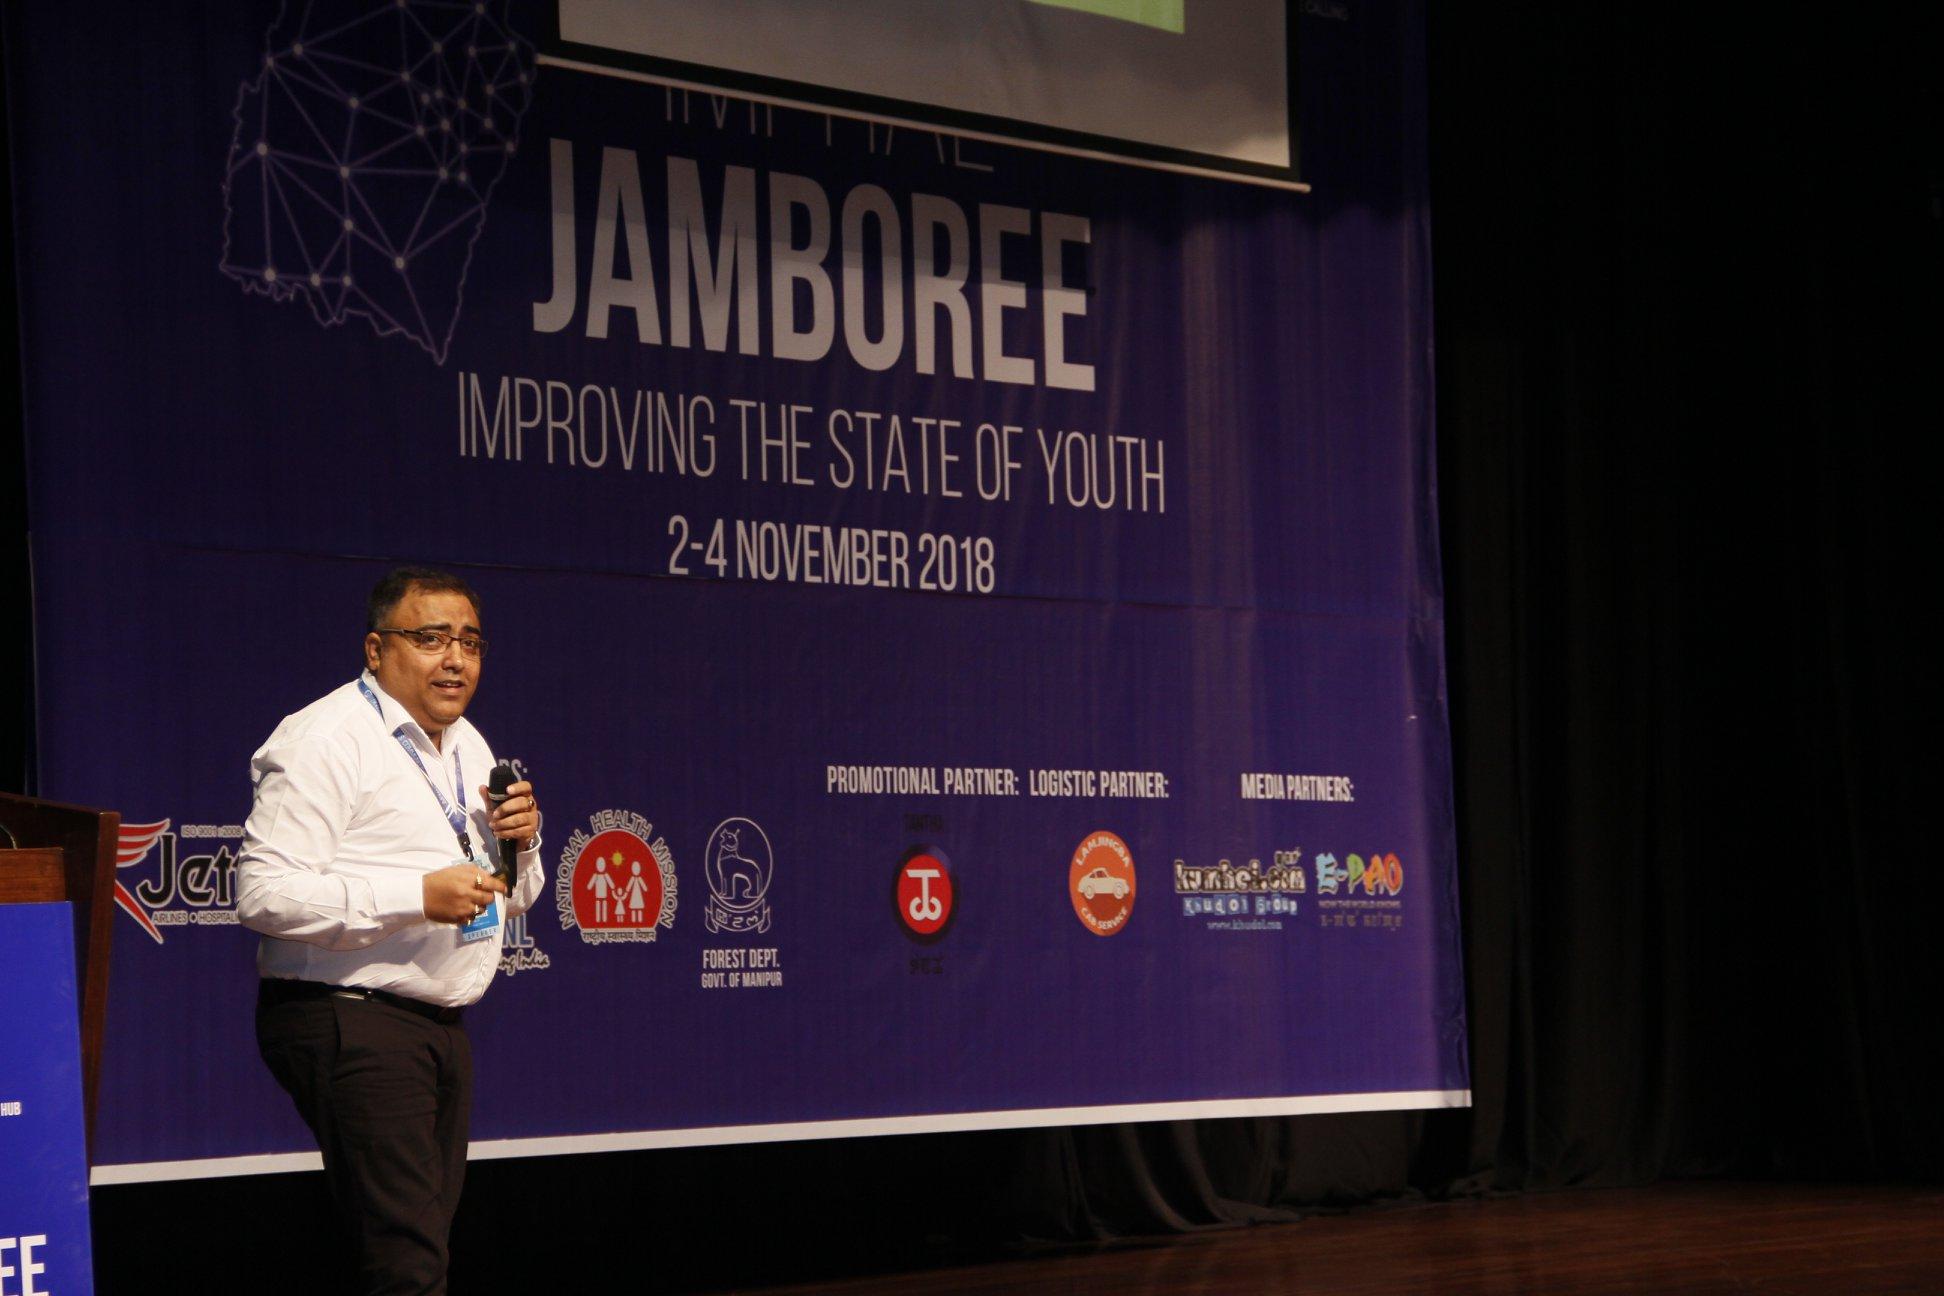 Jambore, Imphal